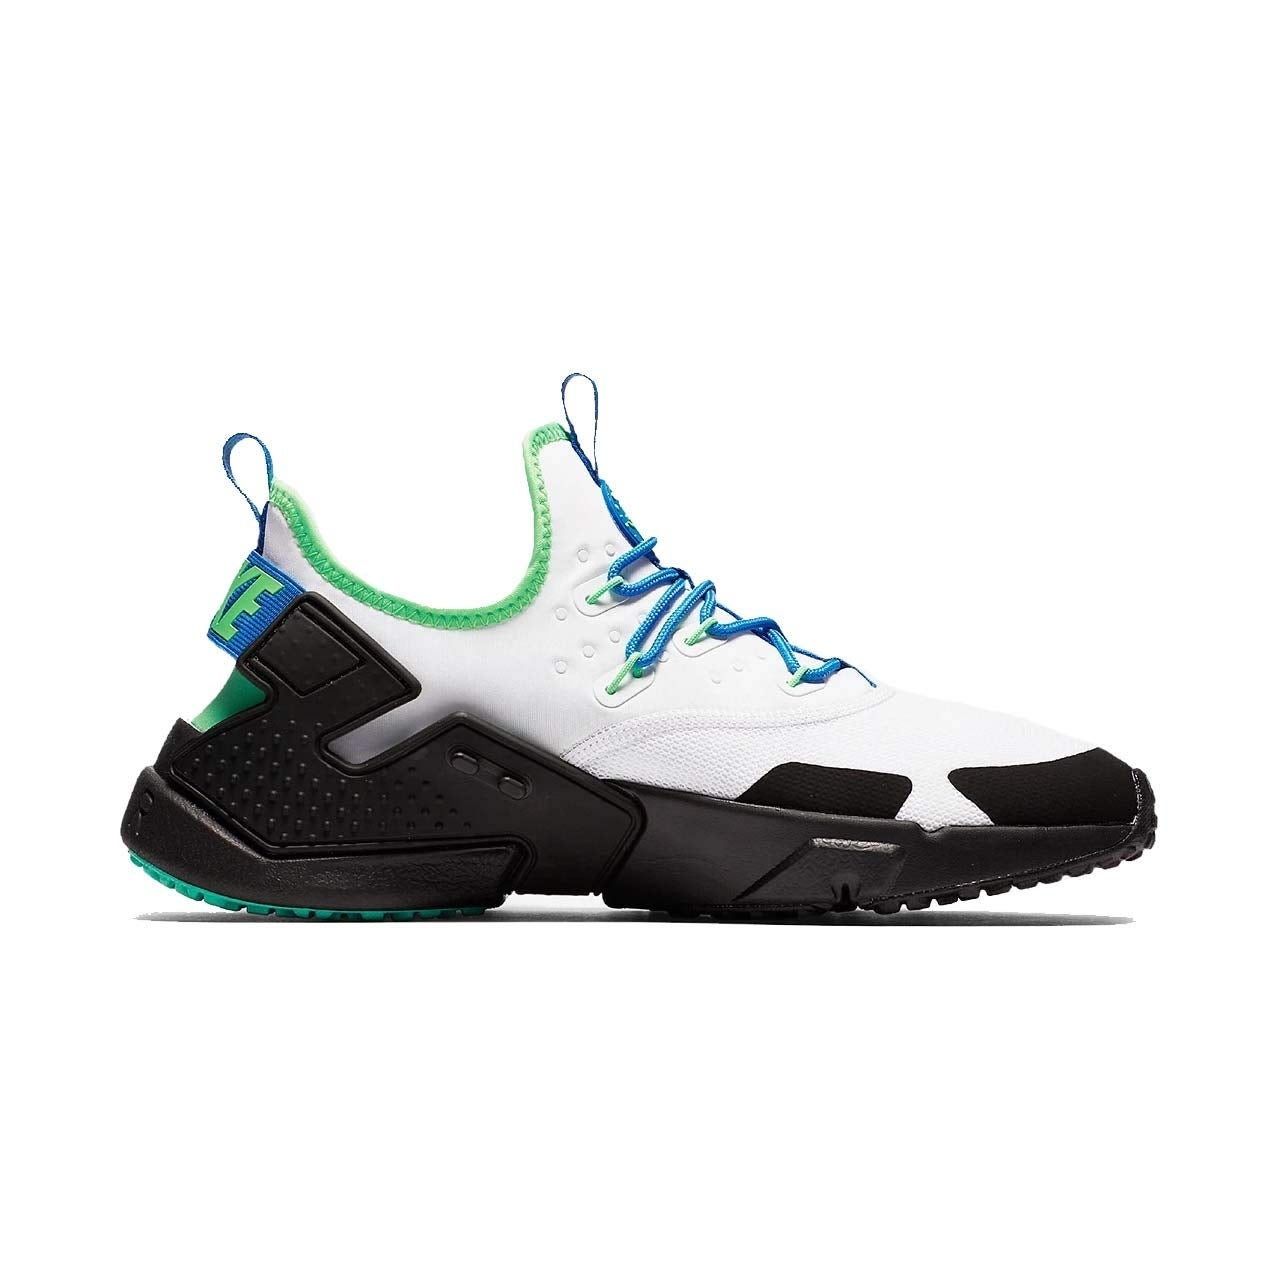 premium selection 10b7f 54257 Shop Nike Air Huarache Run PRM, Men s Gymnastics Shoes - Free Shipping  Today - Overstock - 28054997